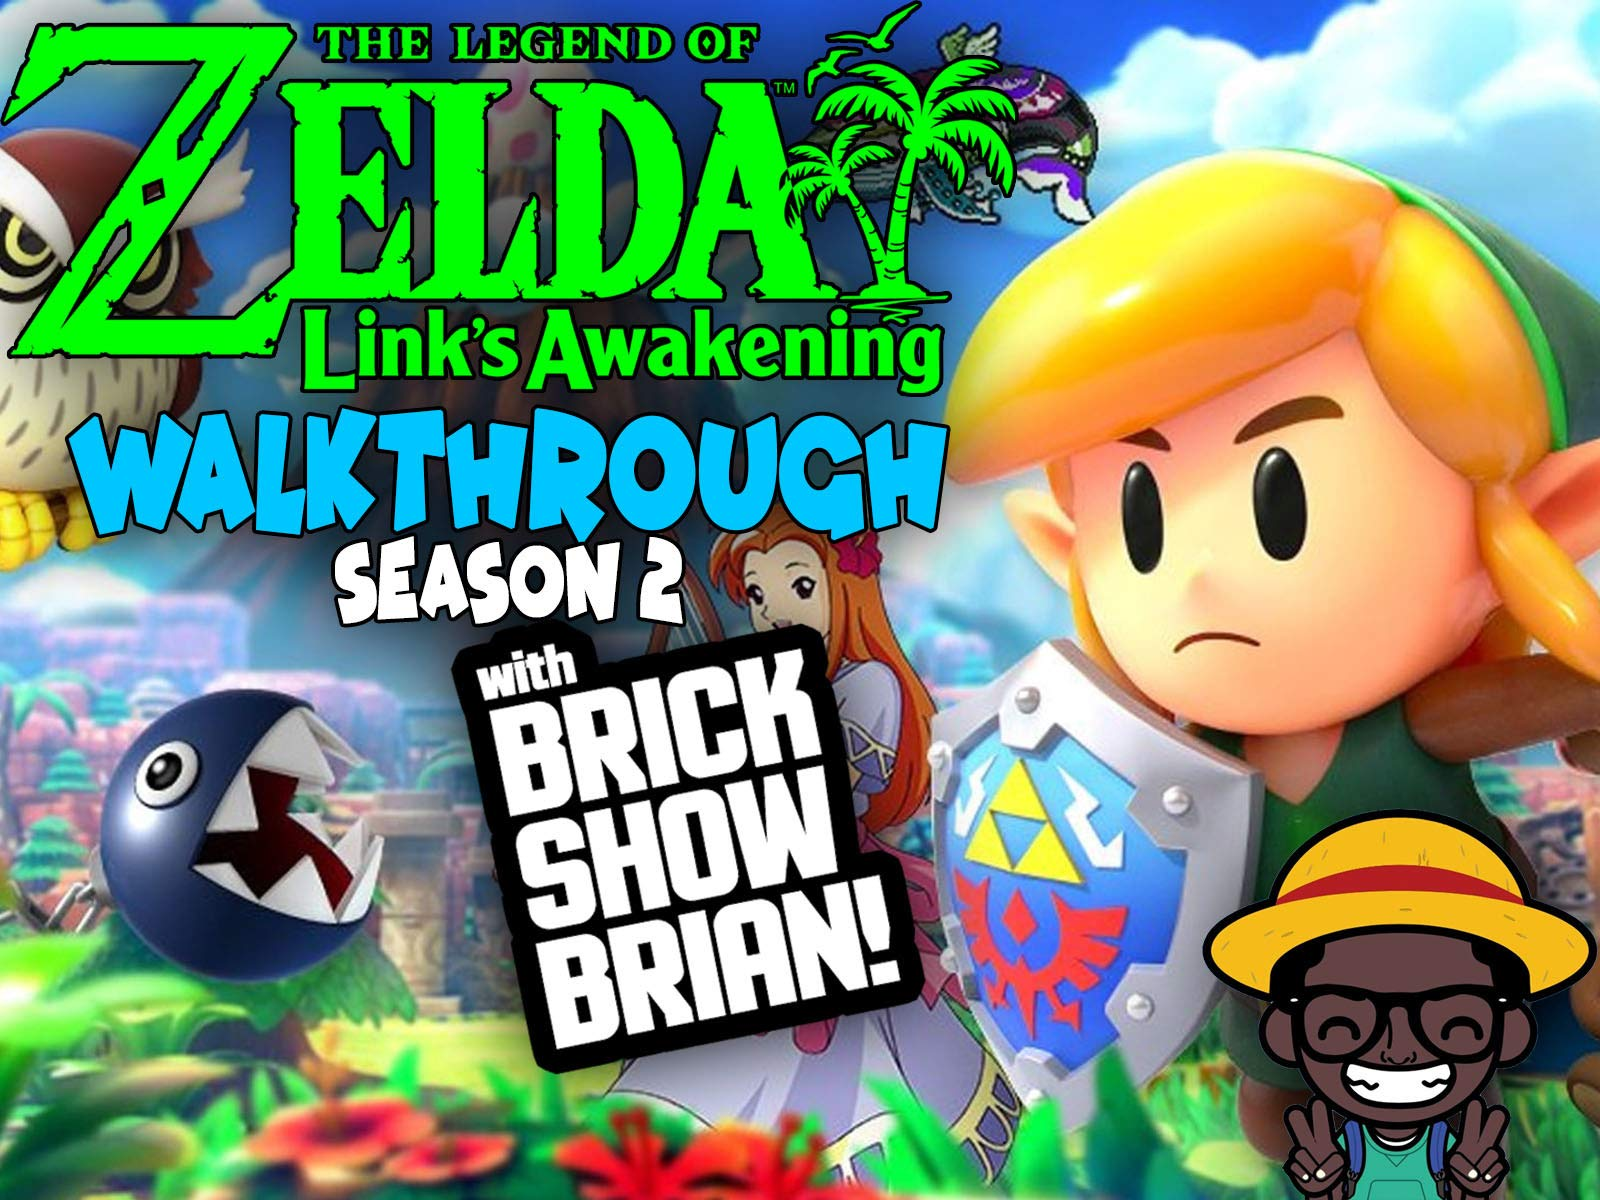 The Legend Of Zelda Links Awakening Walkthrough With Brick Show Brian - Season 2